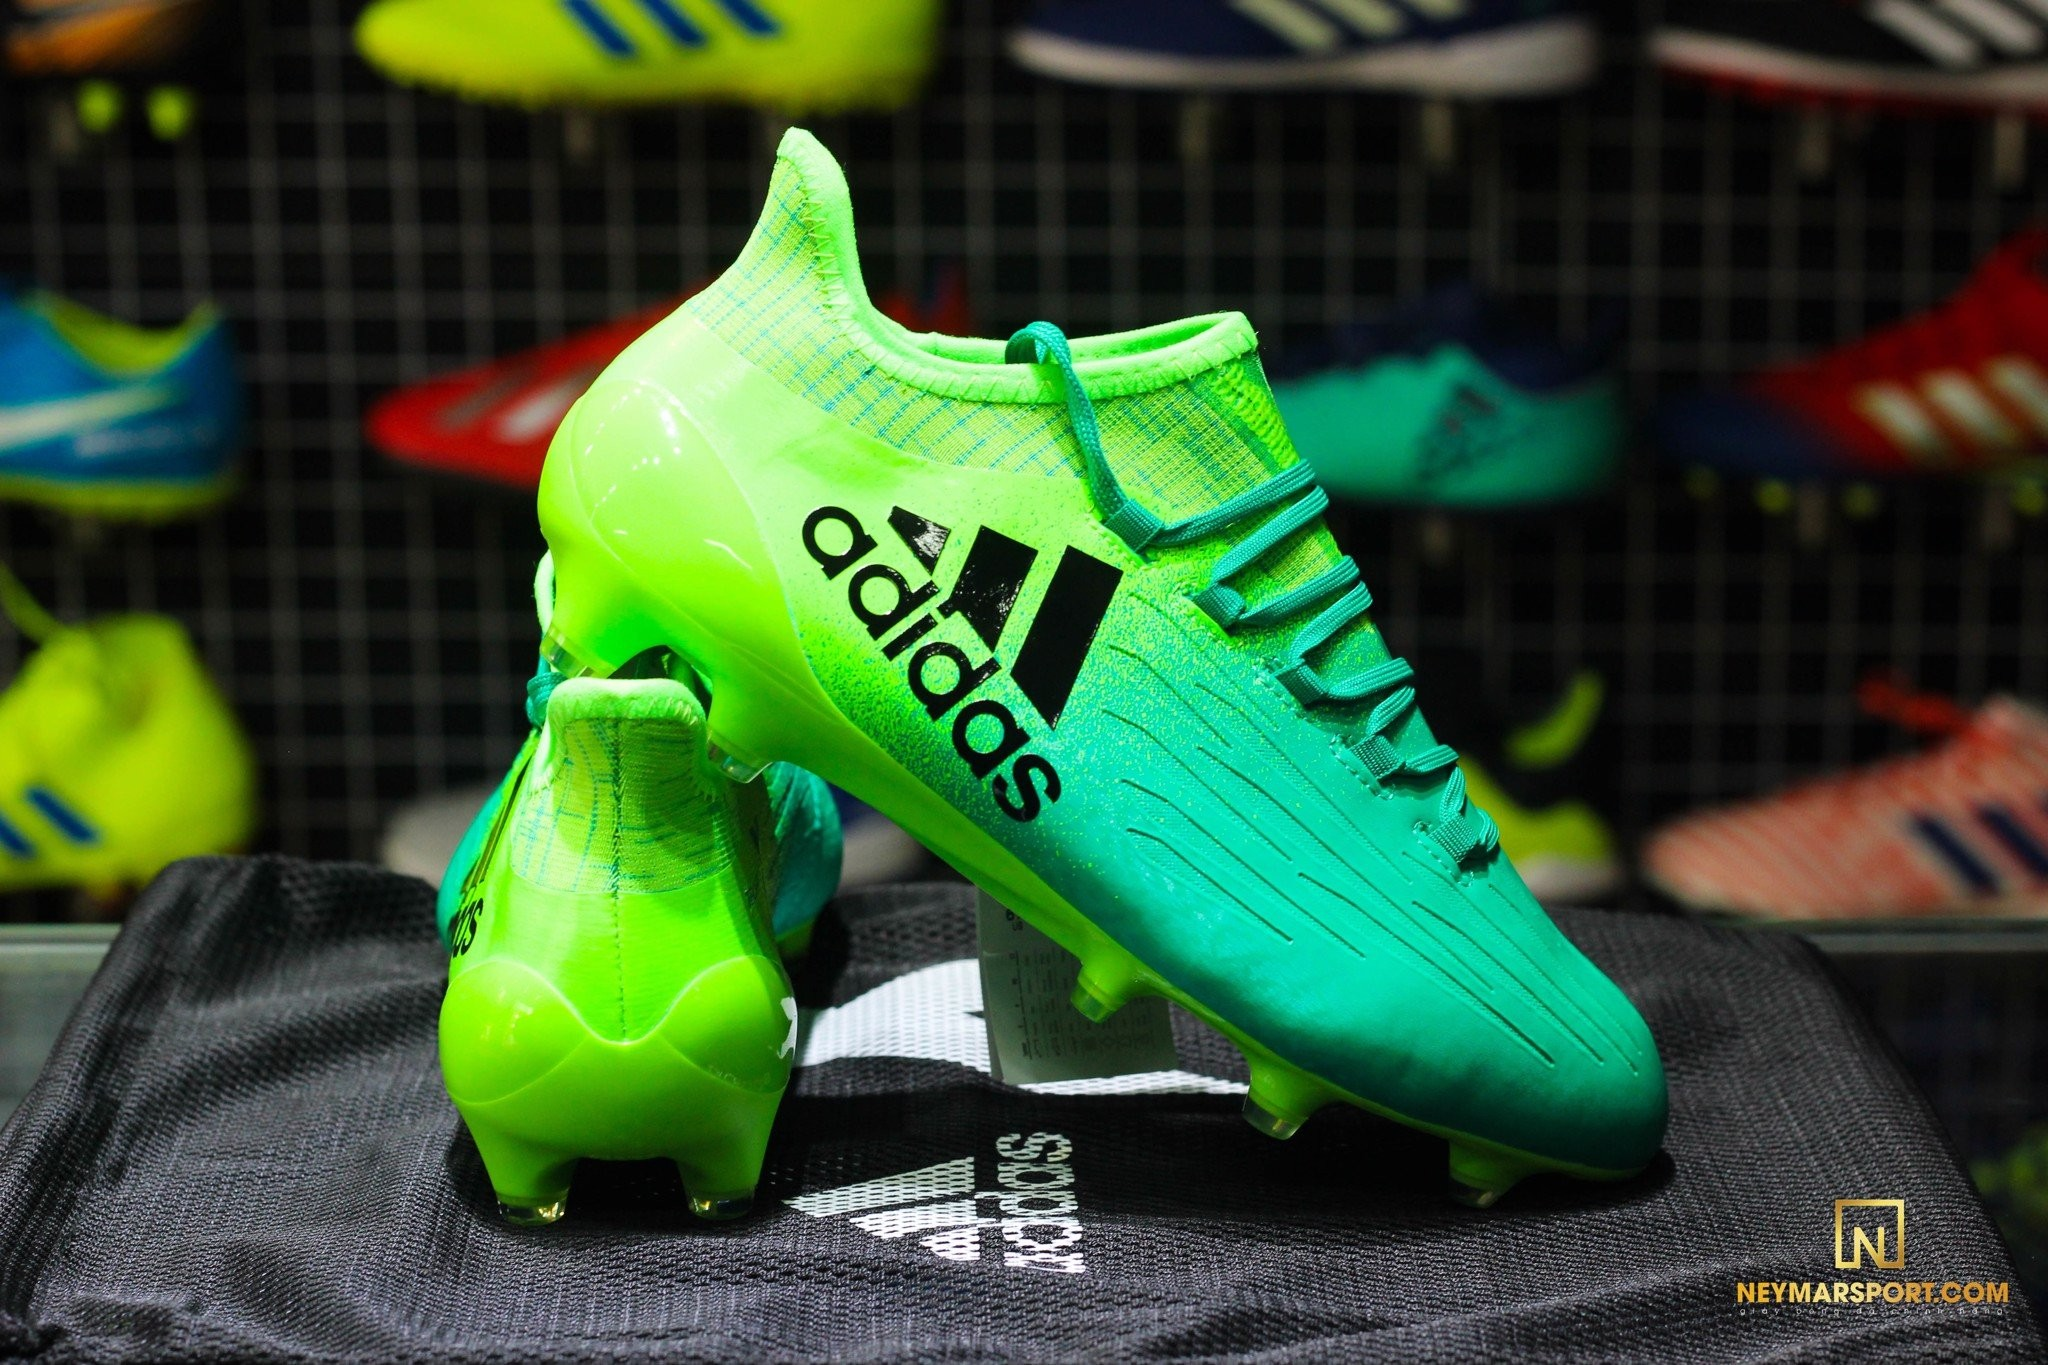 Giày bóng đá Adidas X16 – 2016